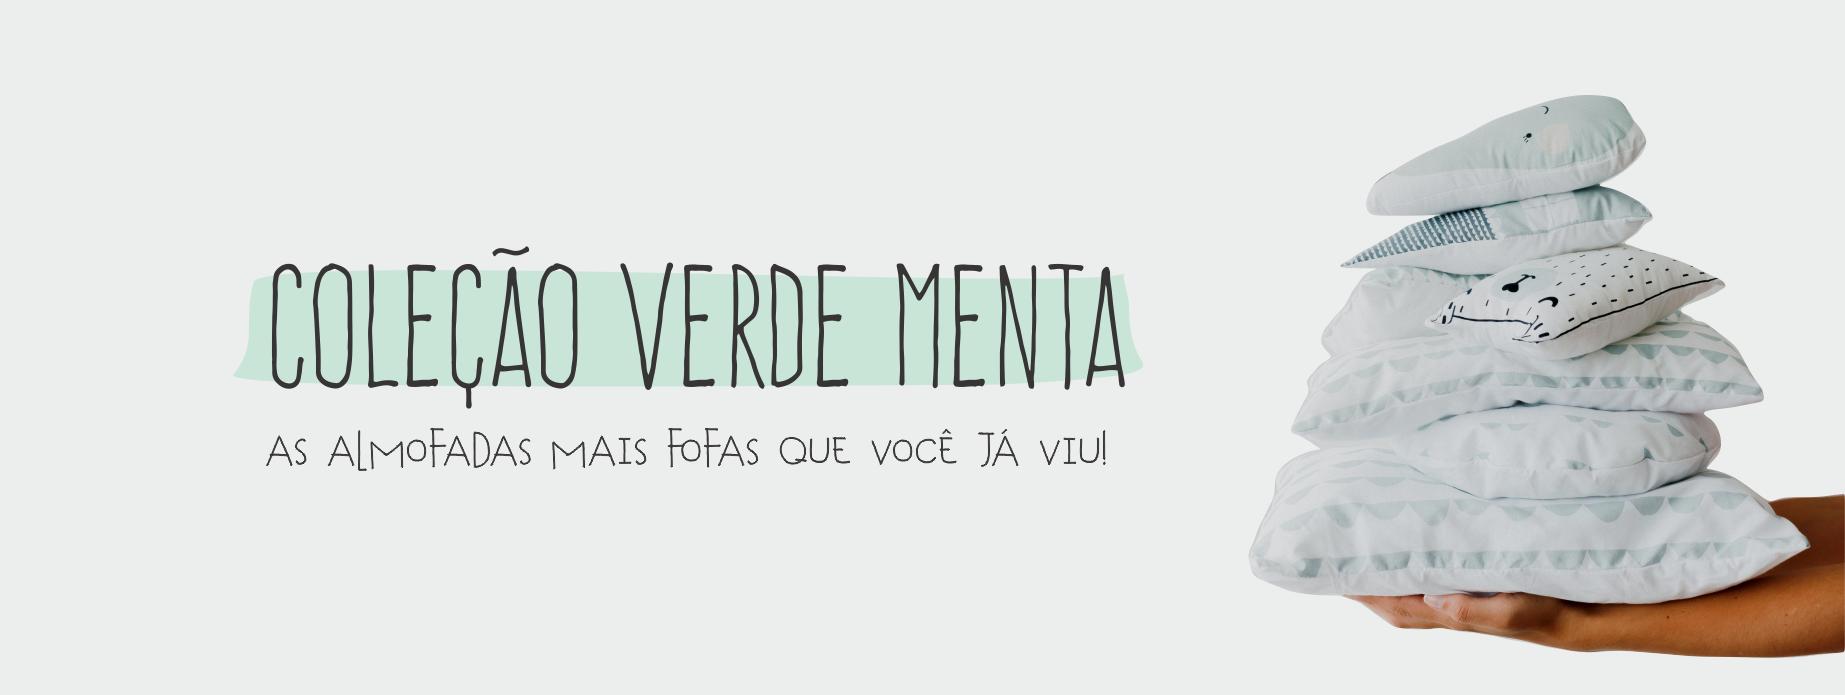 banner VERDE MENTA